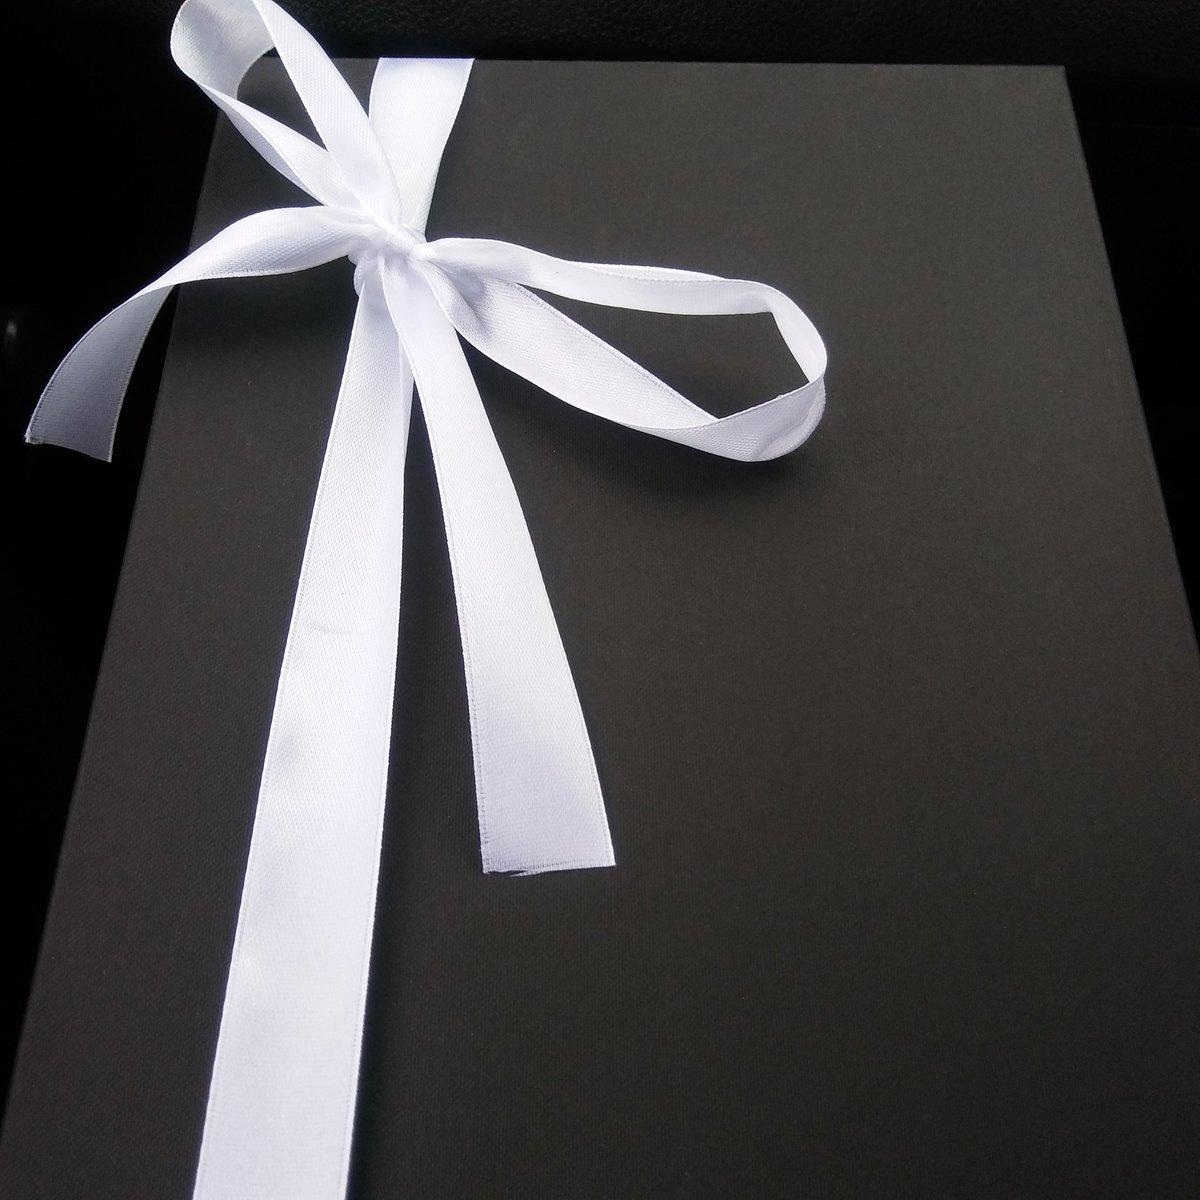 Box of Bliss on Twitter: